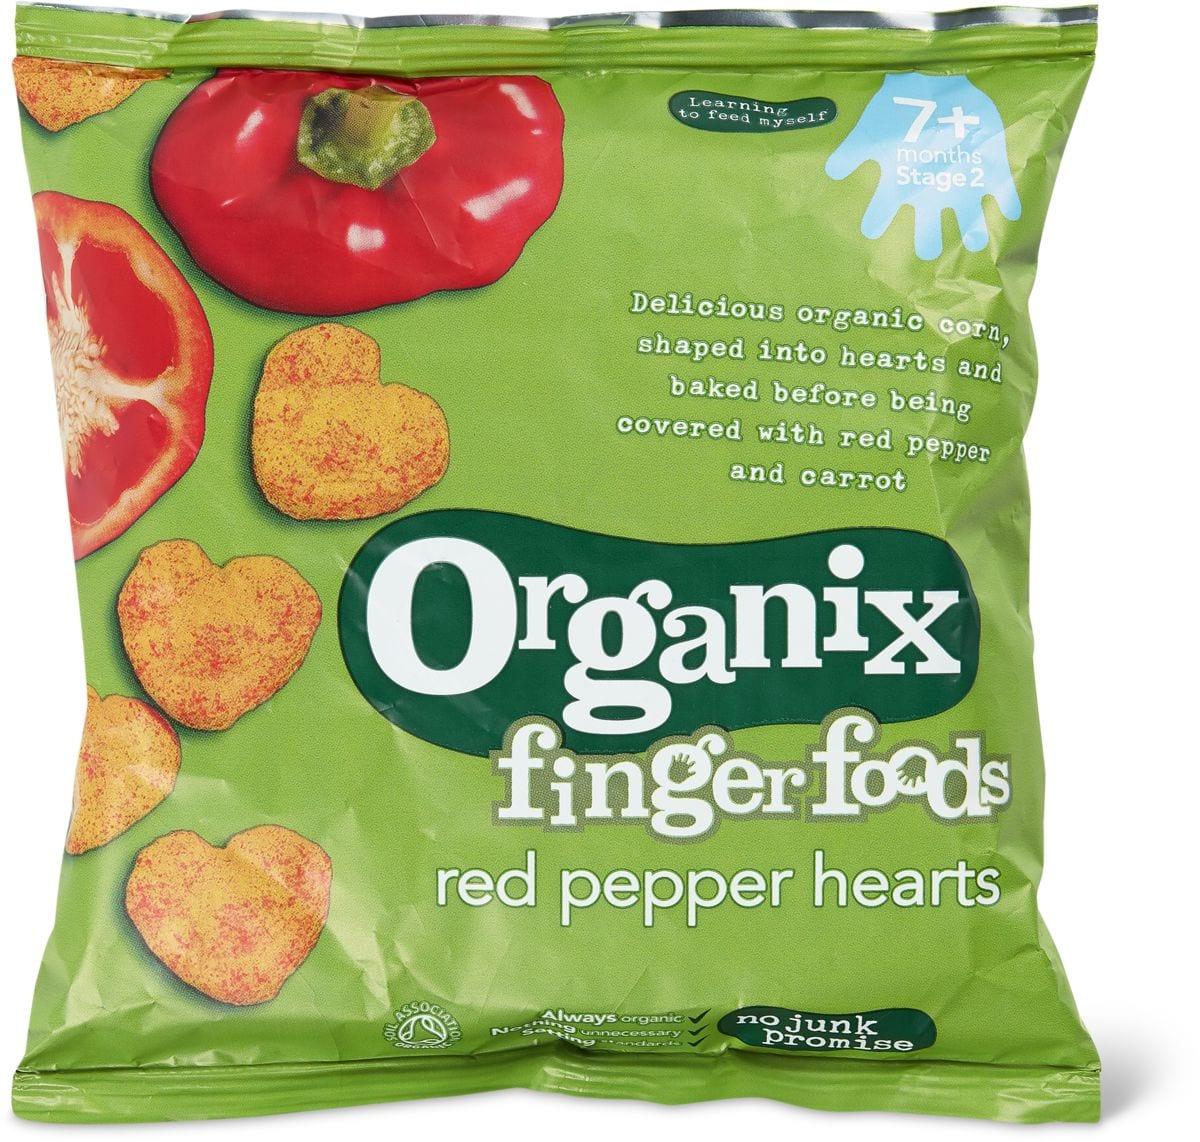 Organix cuori di peperoni rosso